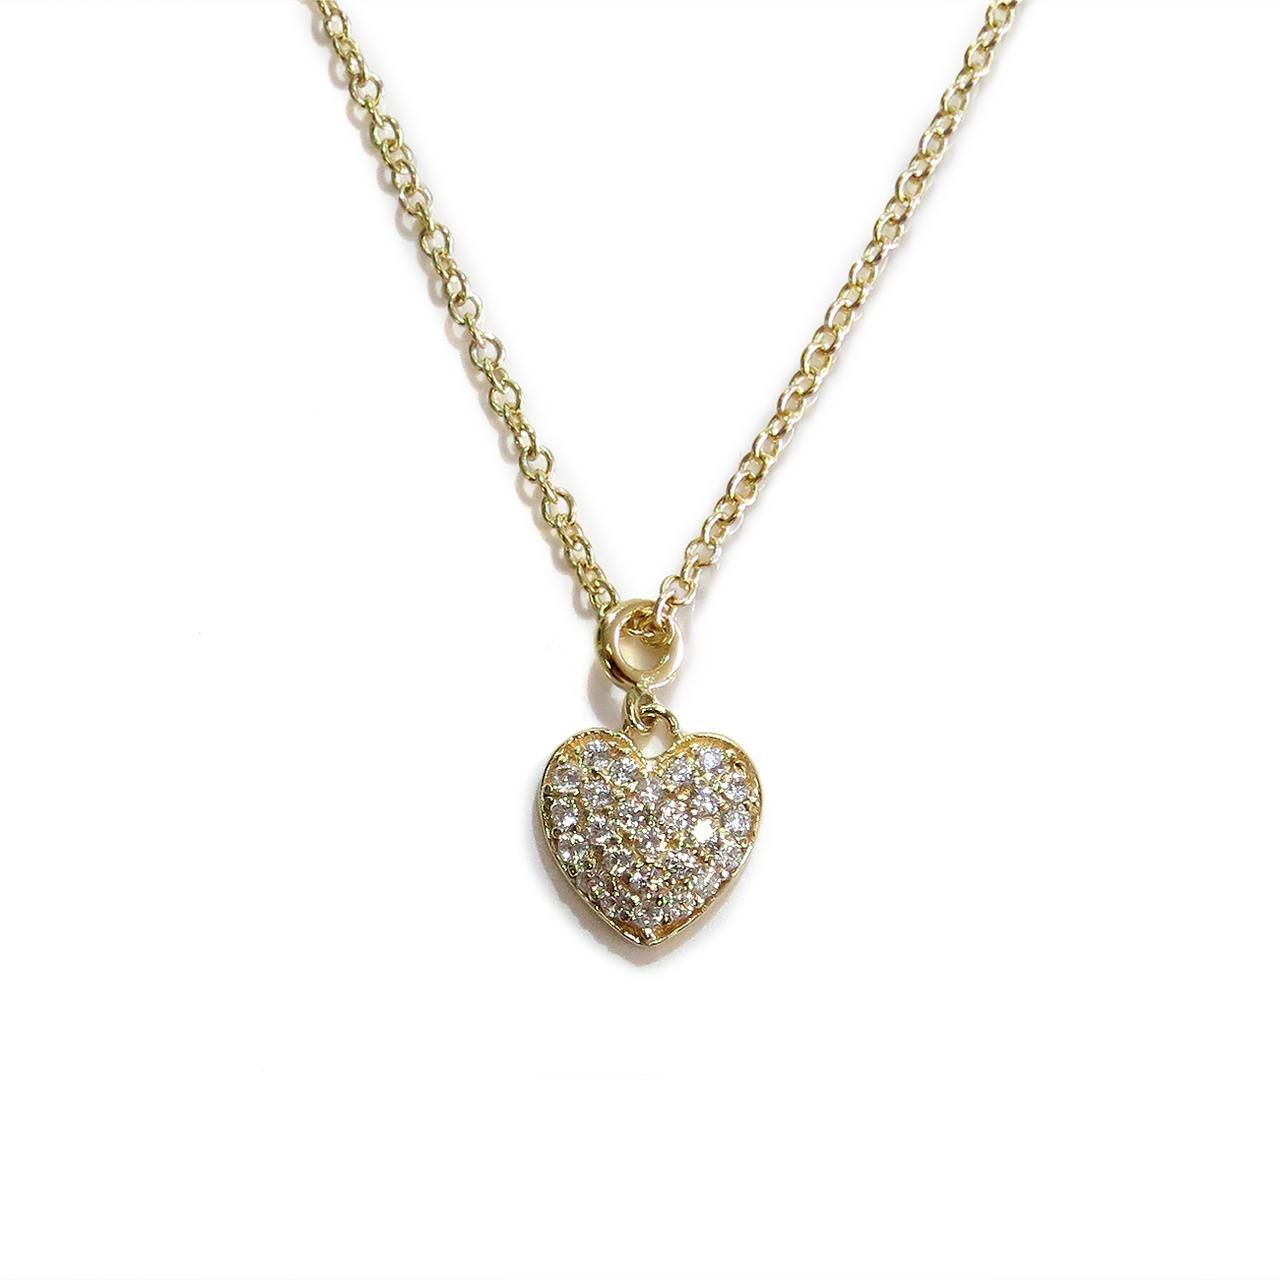 Gold Delicate Heart Necklace | Liza Schwartz